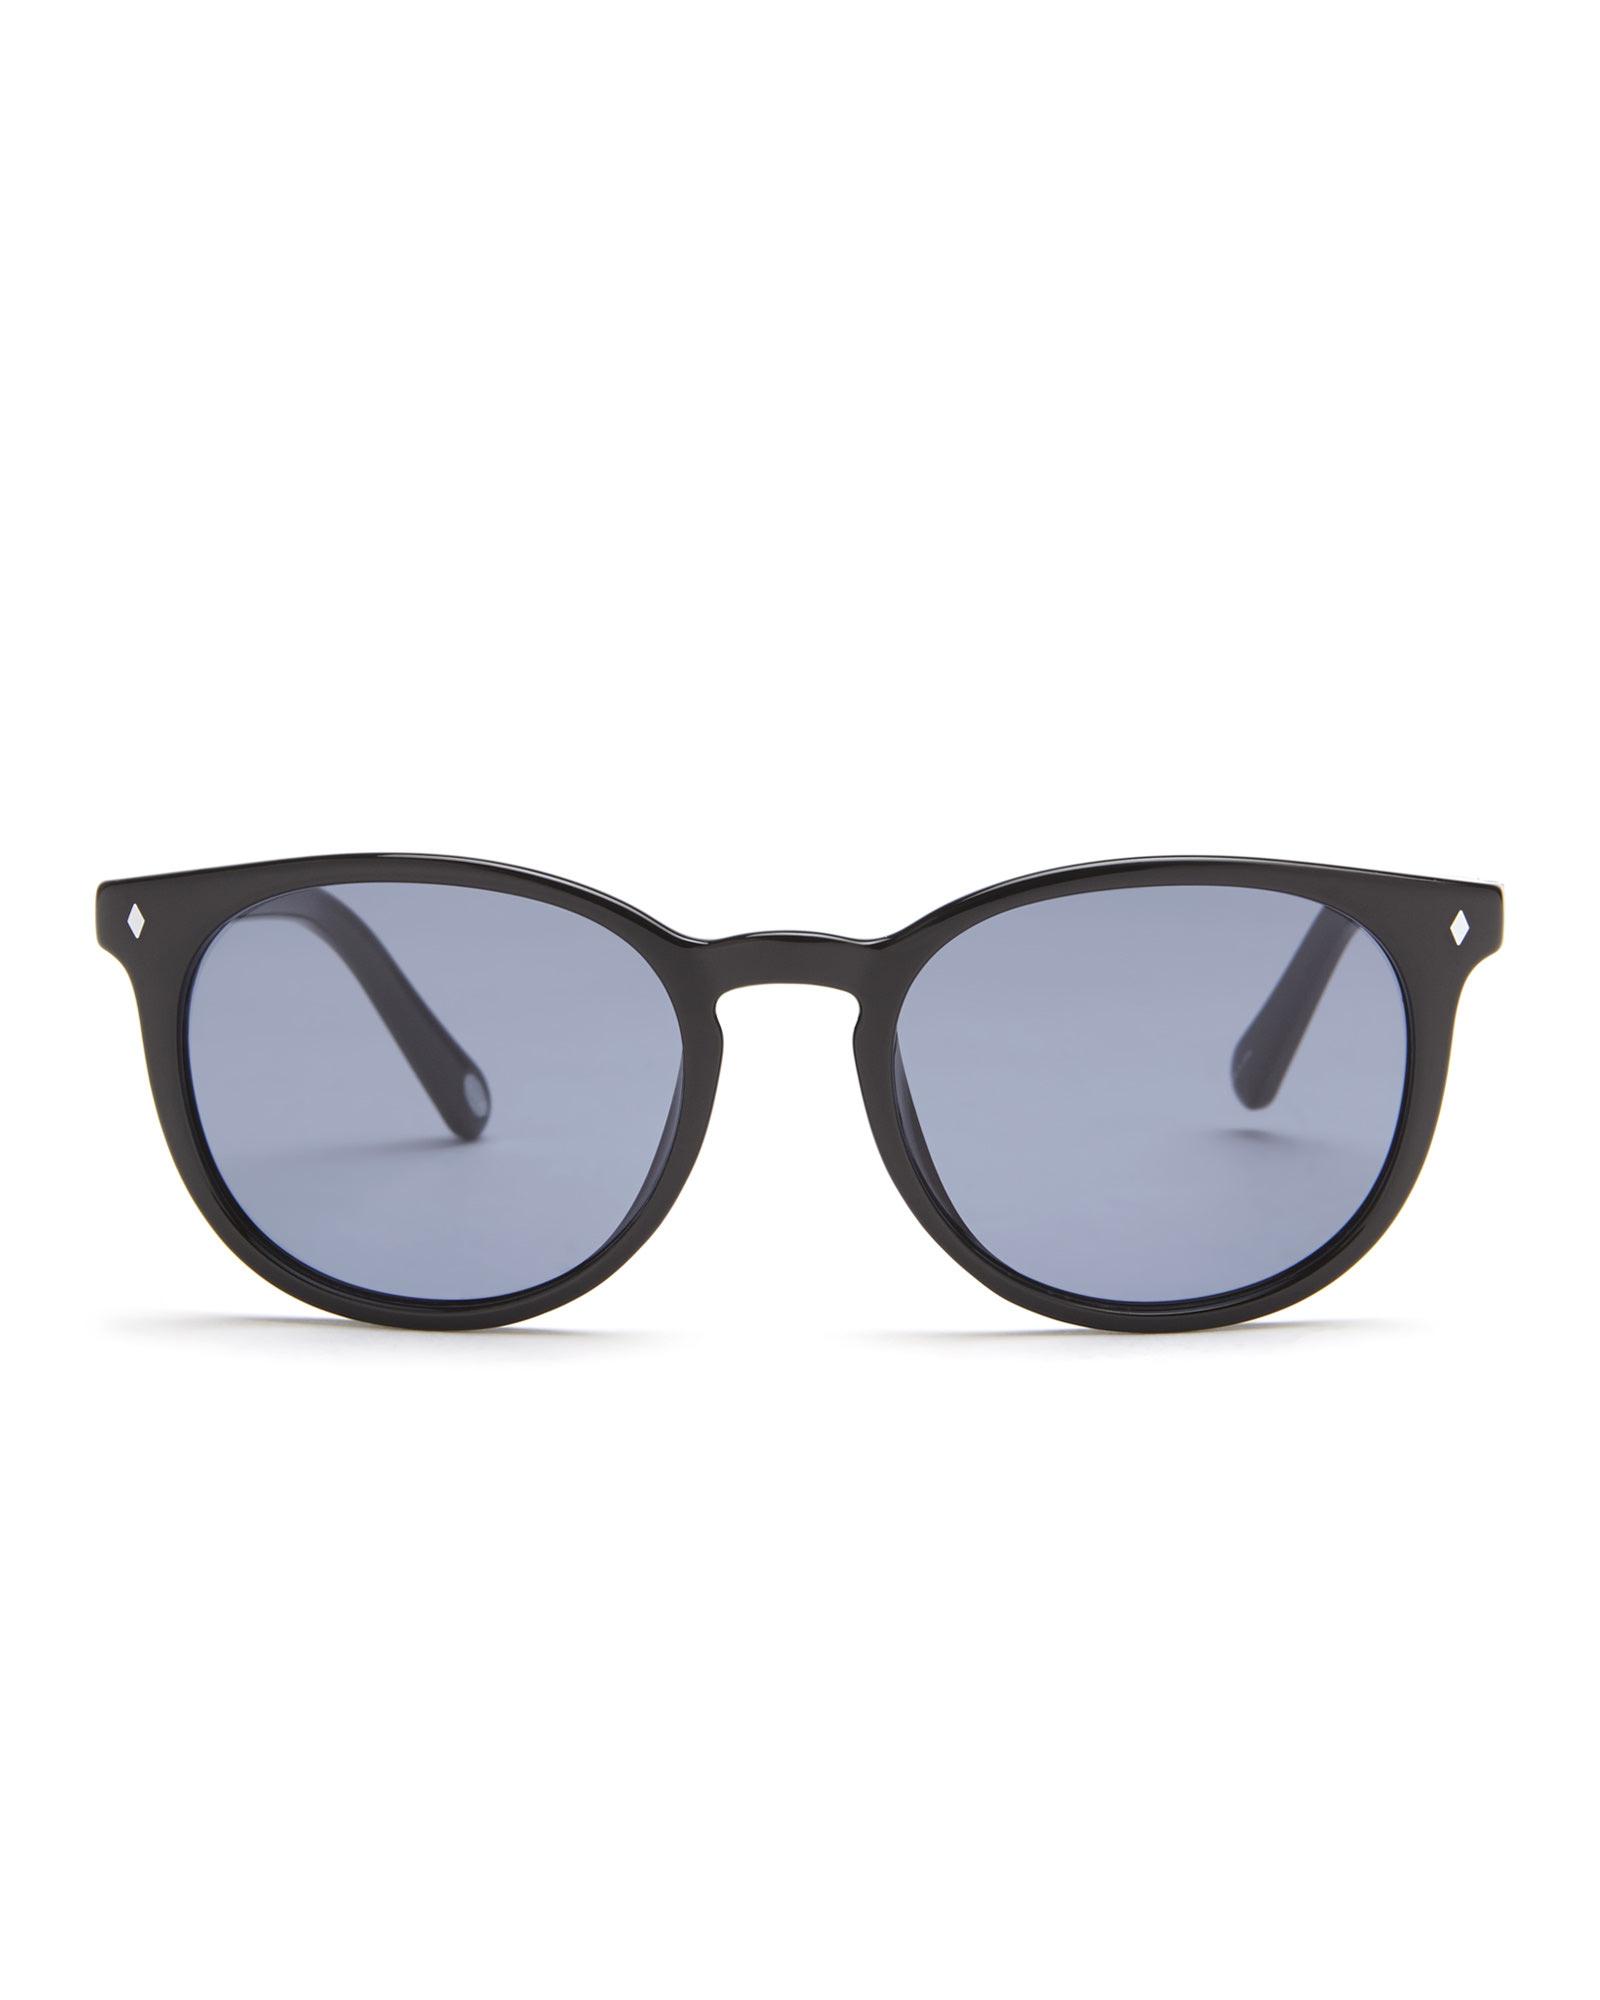 883099ae03 Lyst - Fossil Black 3016 S Pantos Sunglasses in Black